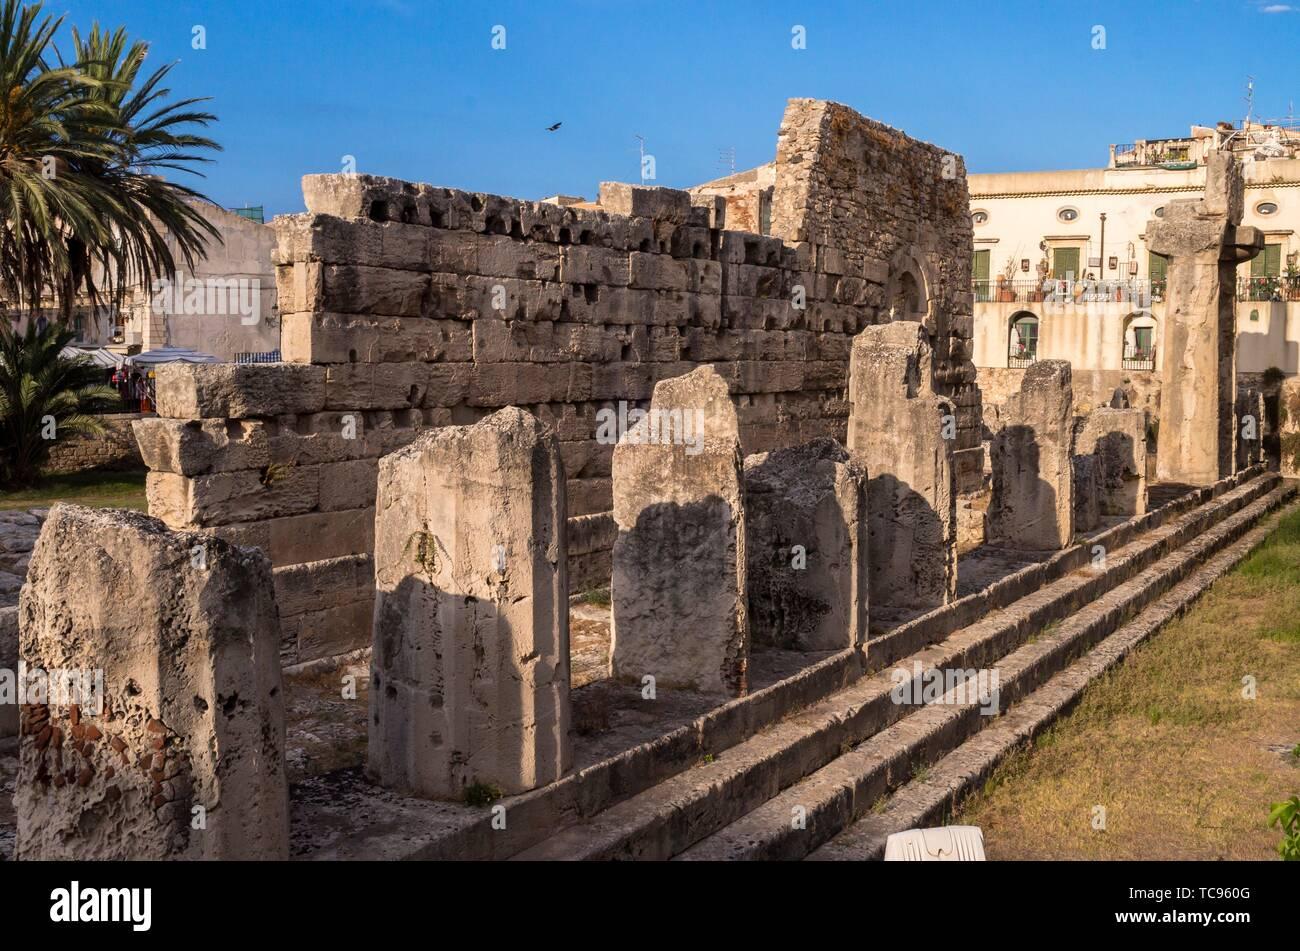 Temple of Apollo, Syracuse, Sicily, Italy. - Stock Image